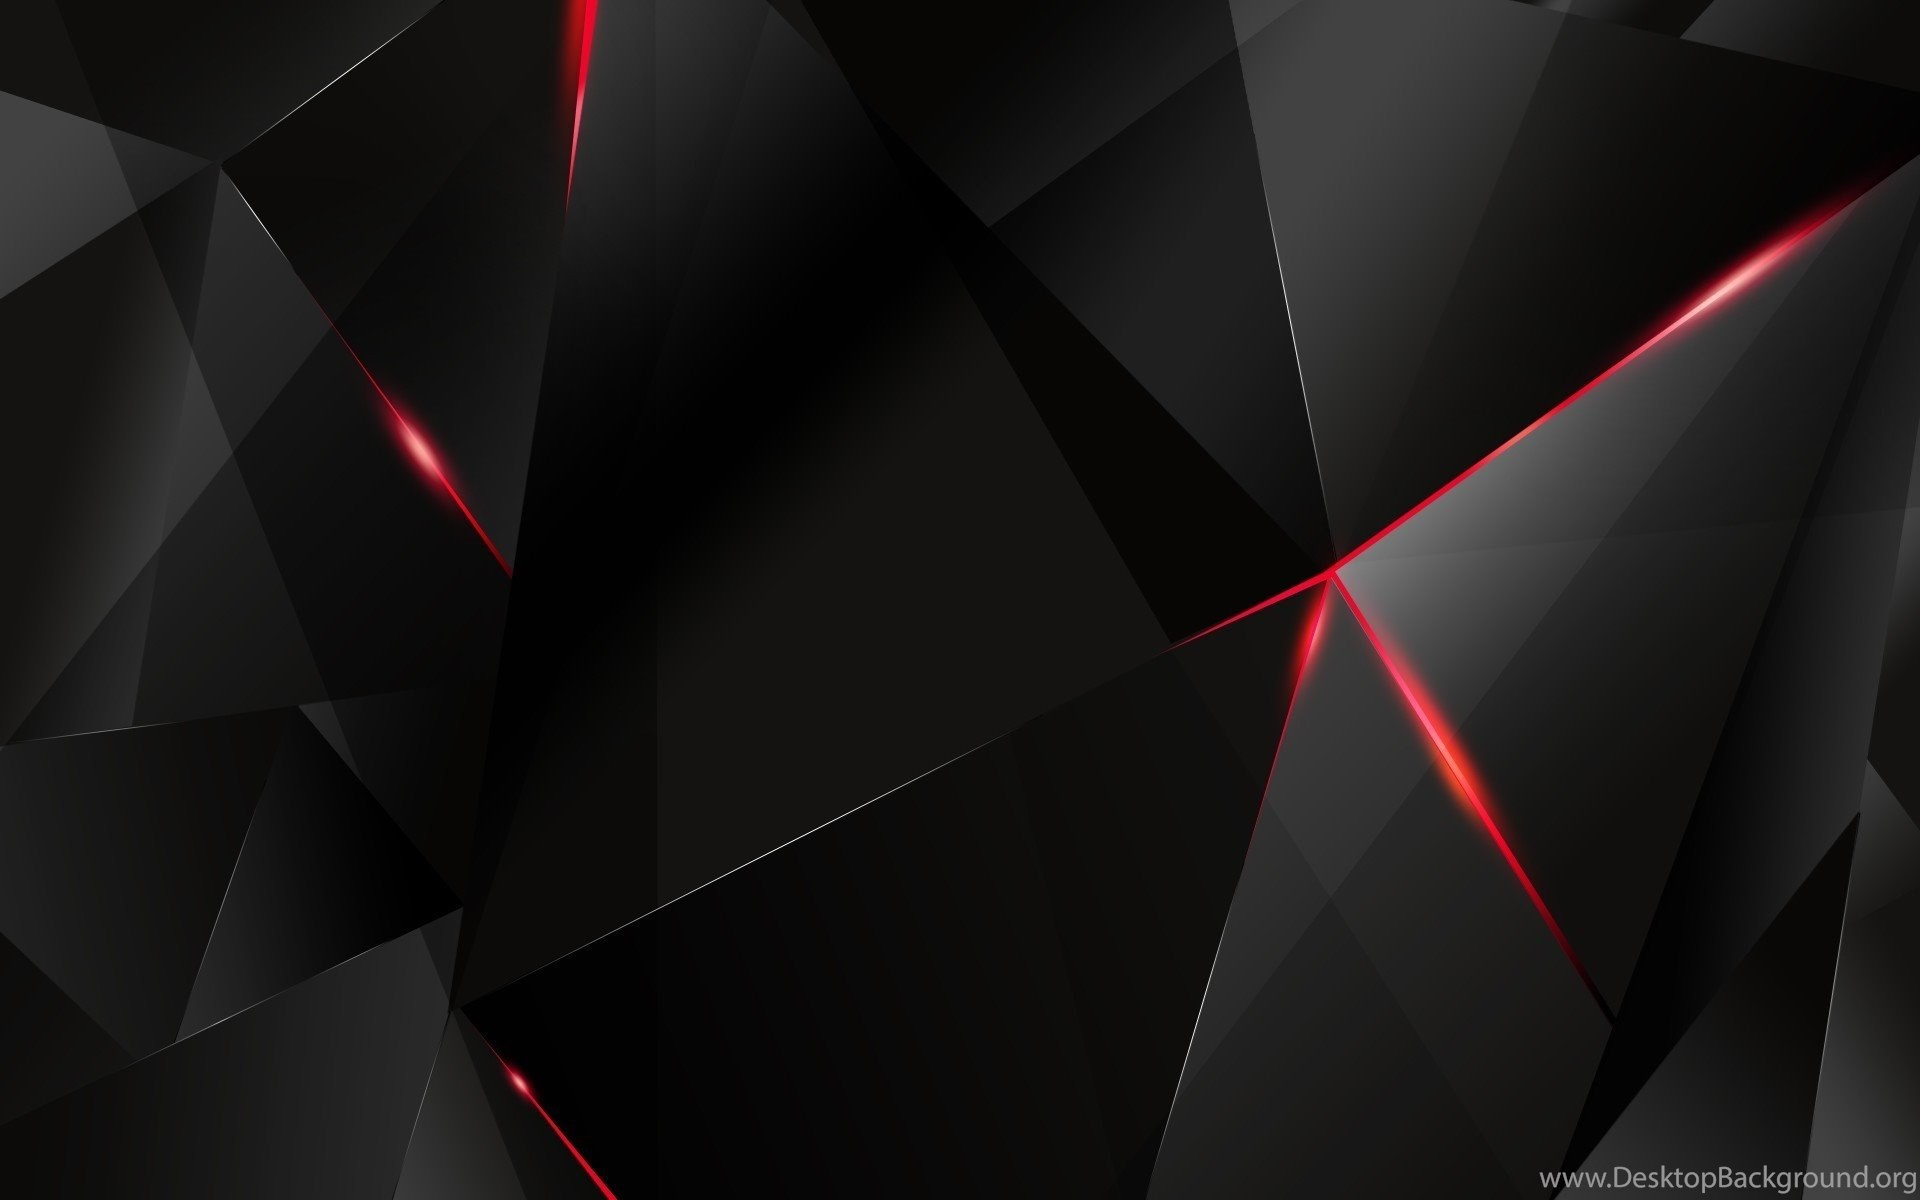 Cool black and red wallpapers desktop backgrounds desktop background widescreen voltagebd Images